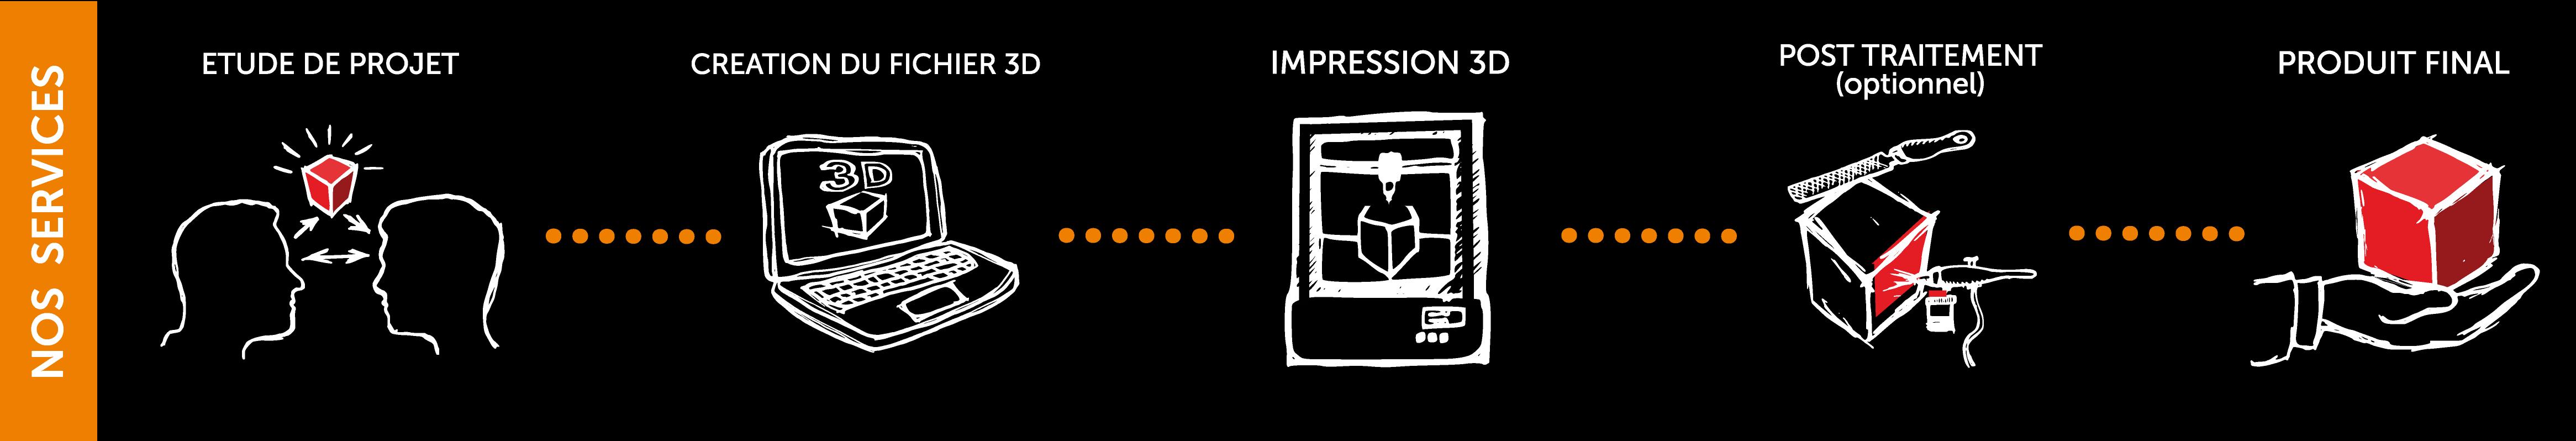 http://addditive.com/impression-3D-nice-addditive.jpg